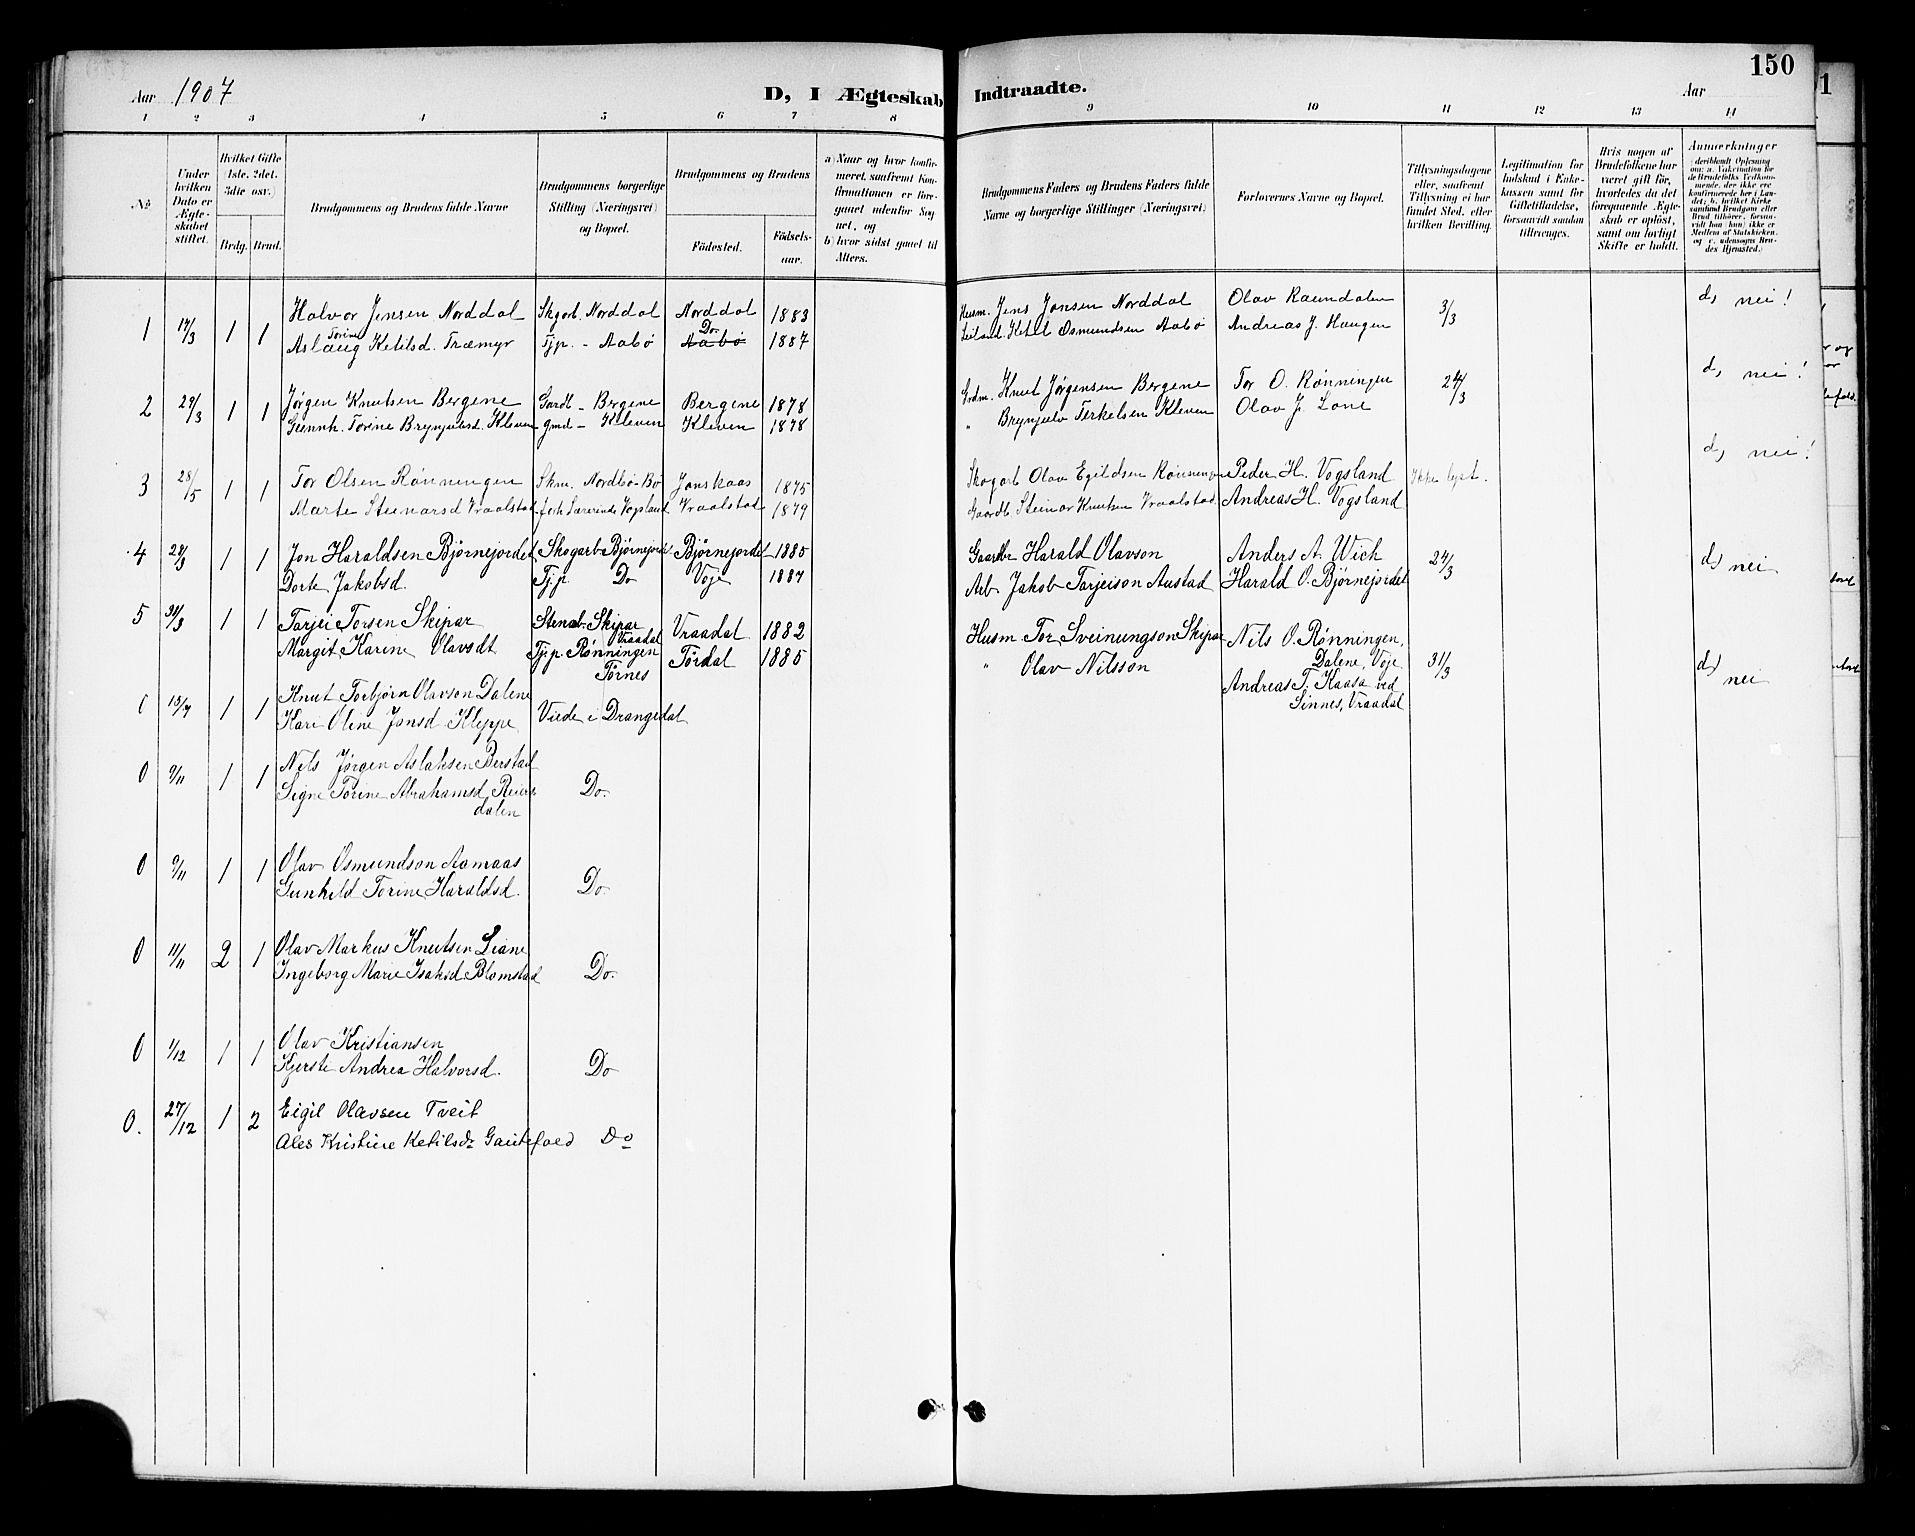 SAKO, Drangedal kirkebøker, G/Gb/L0002: Klokkerbok nr. II 2, 1895-1918, s. 150